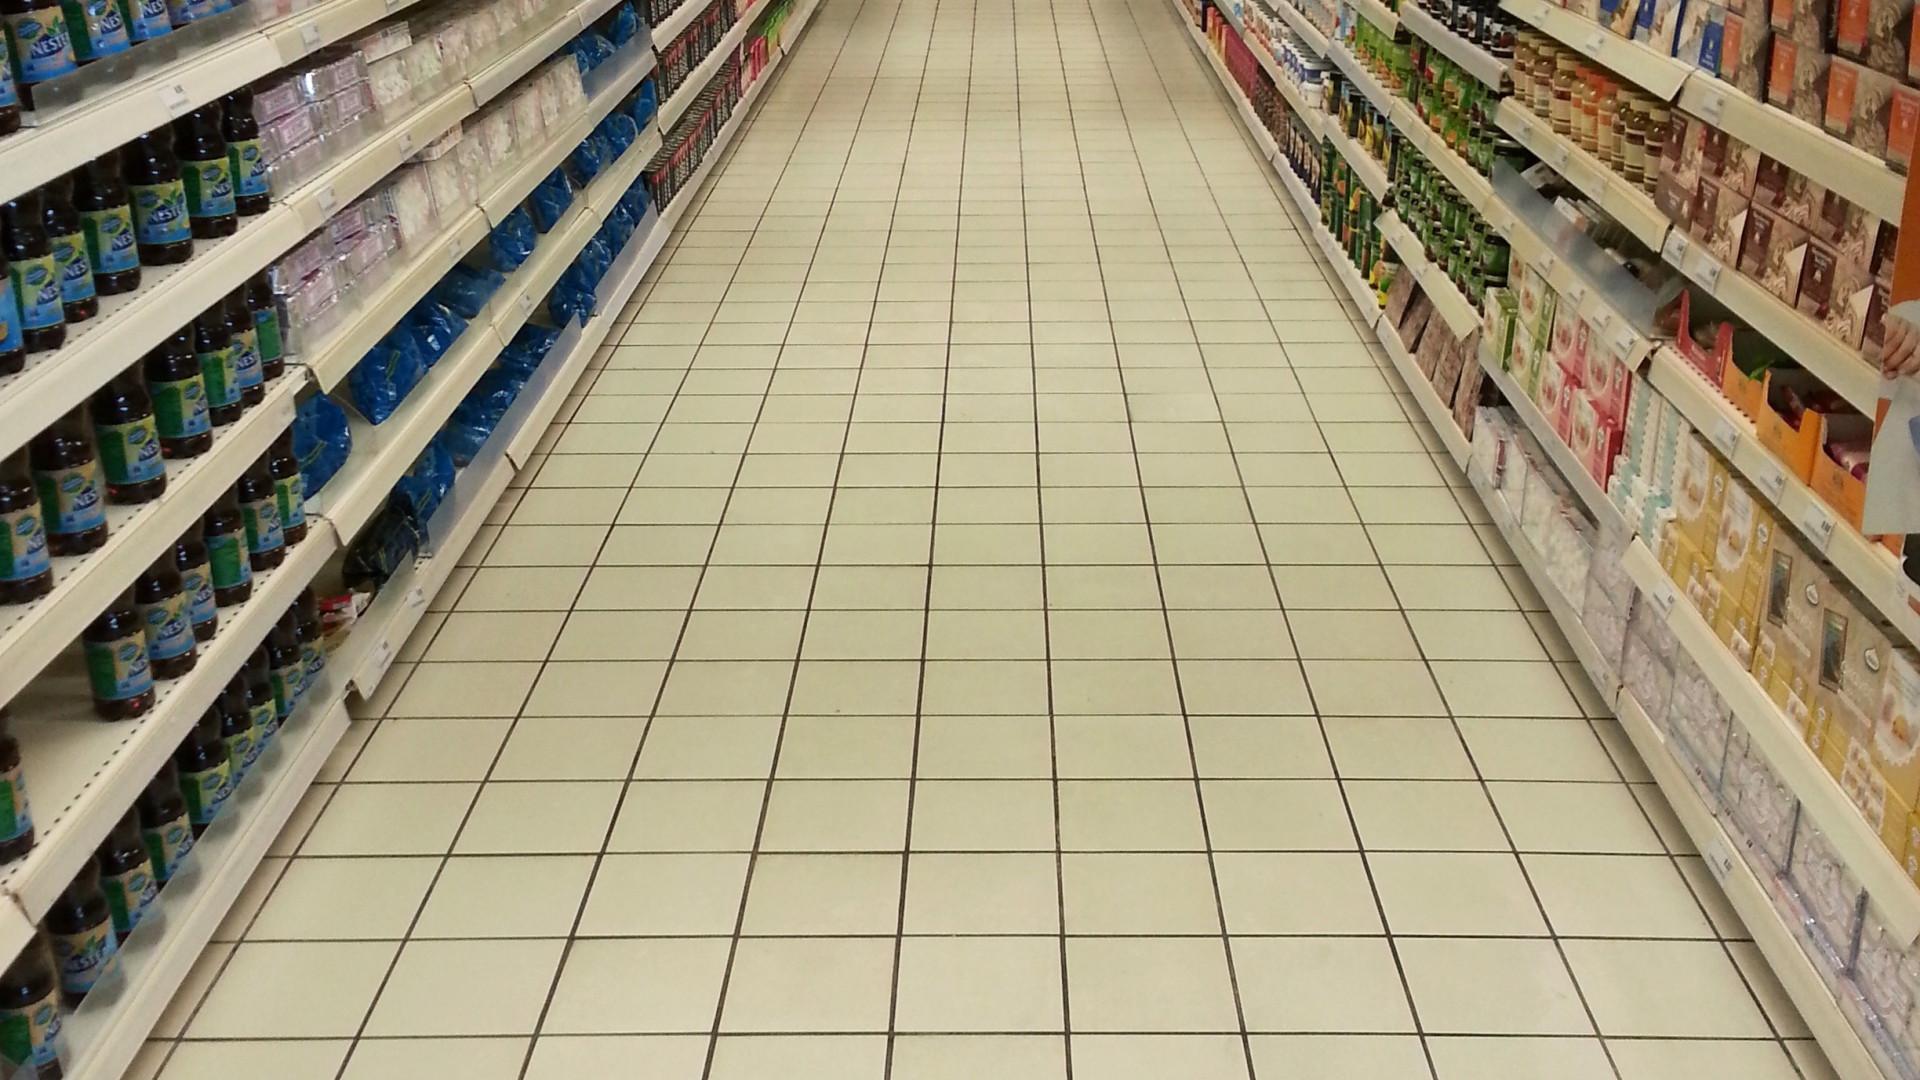 Os segredos dos supermercados para 'ludibriar' os consumidores